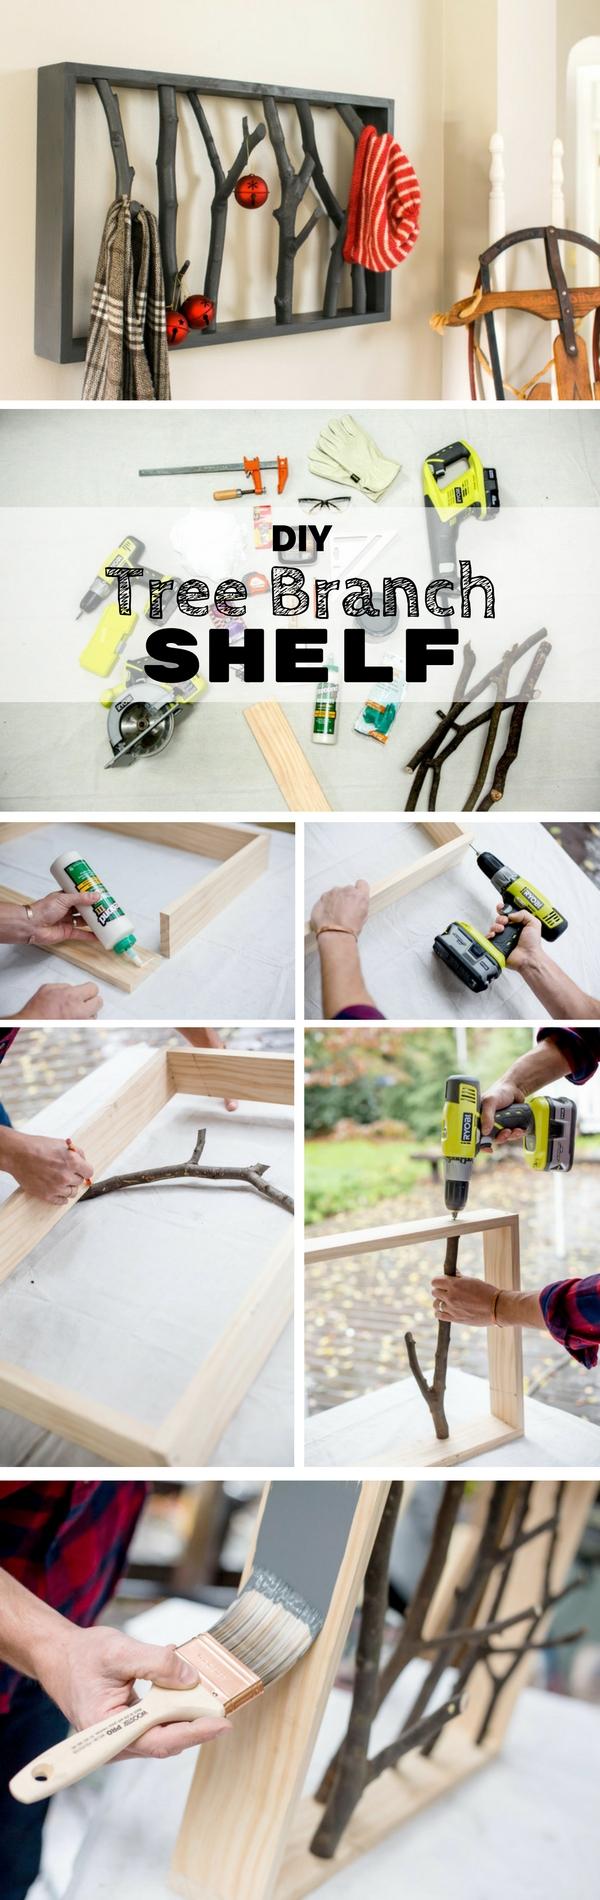 DIY ράφια1